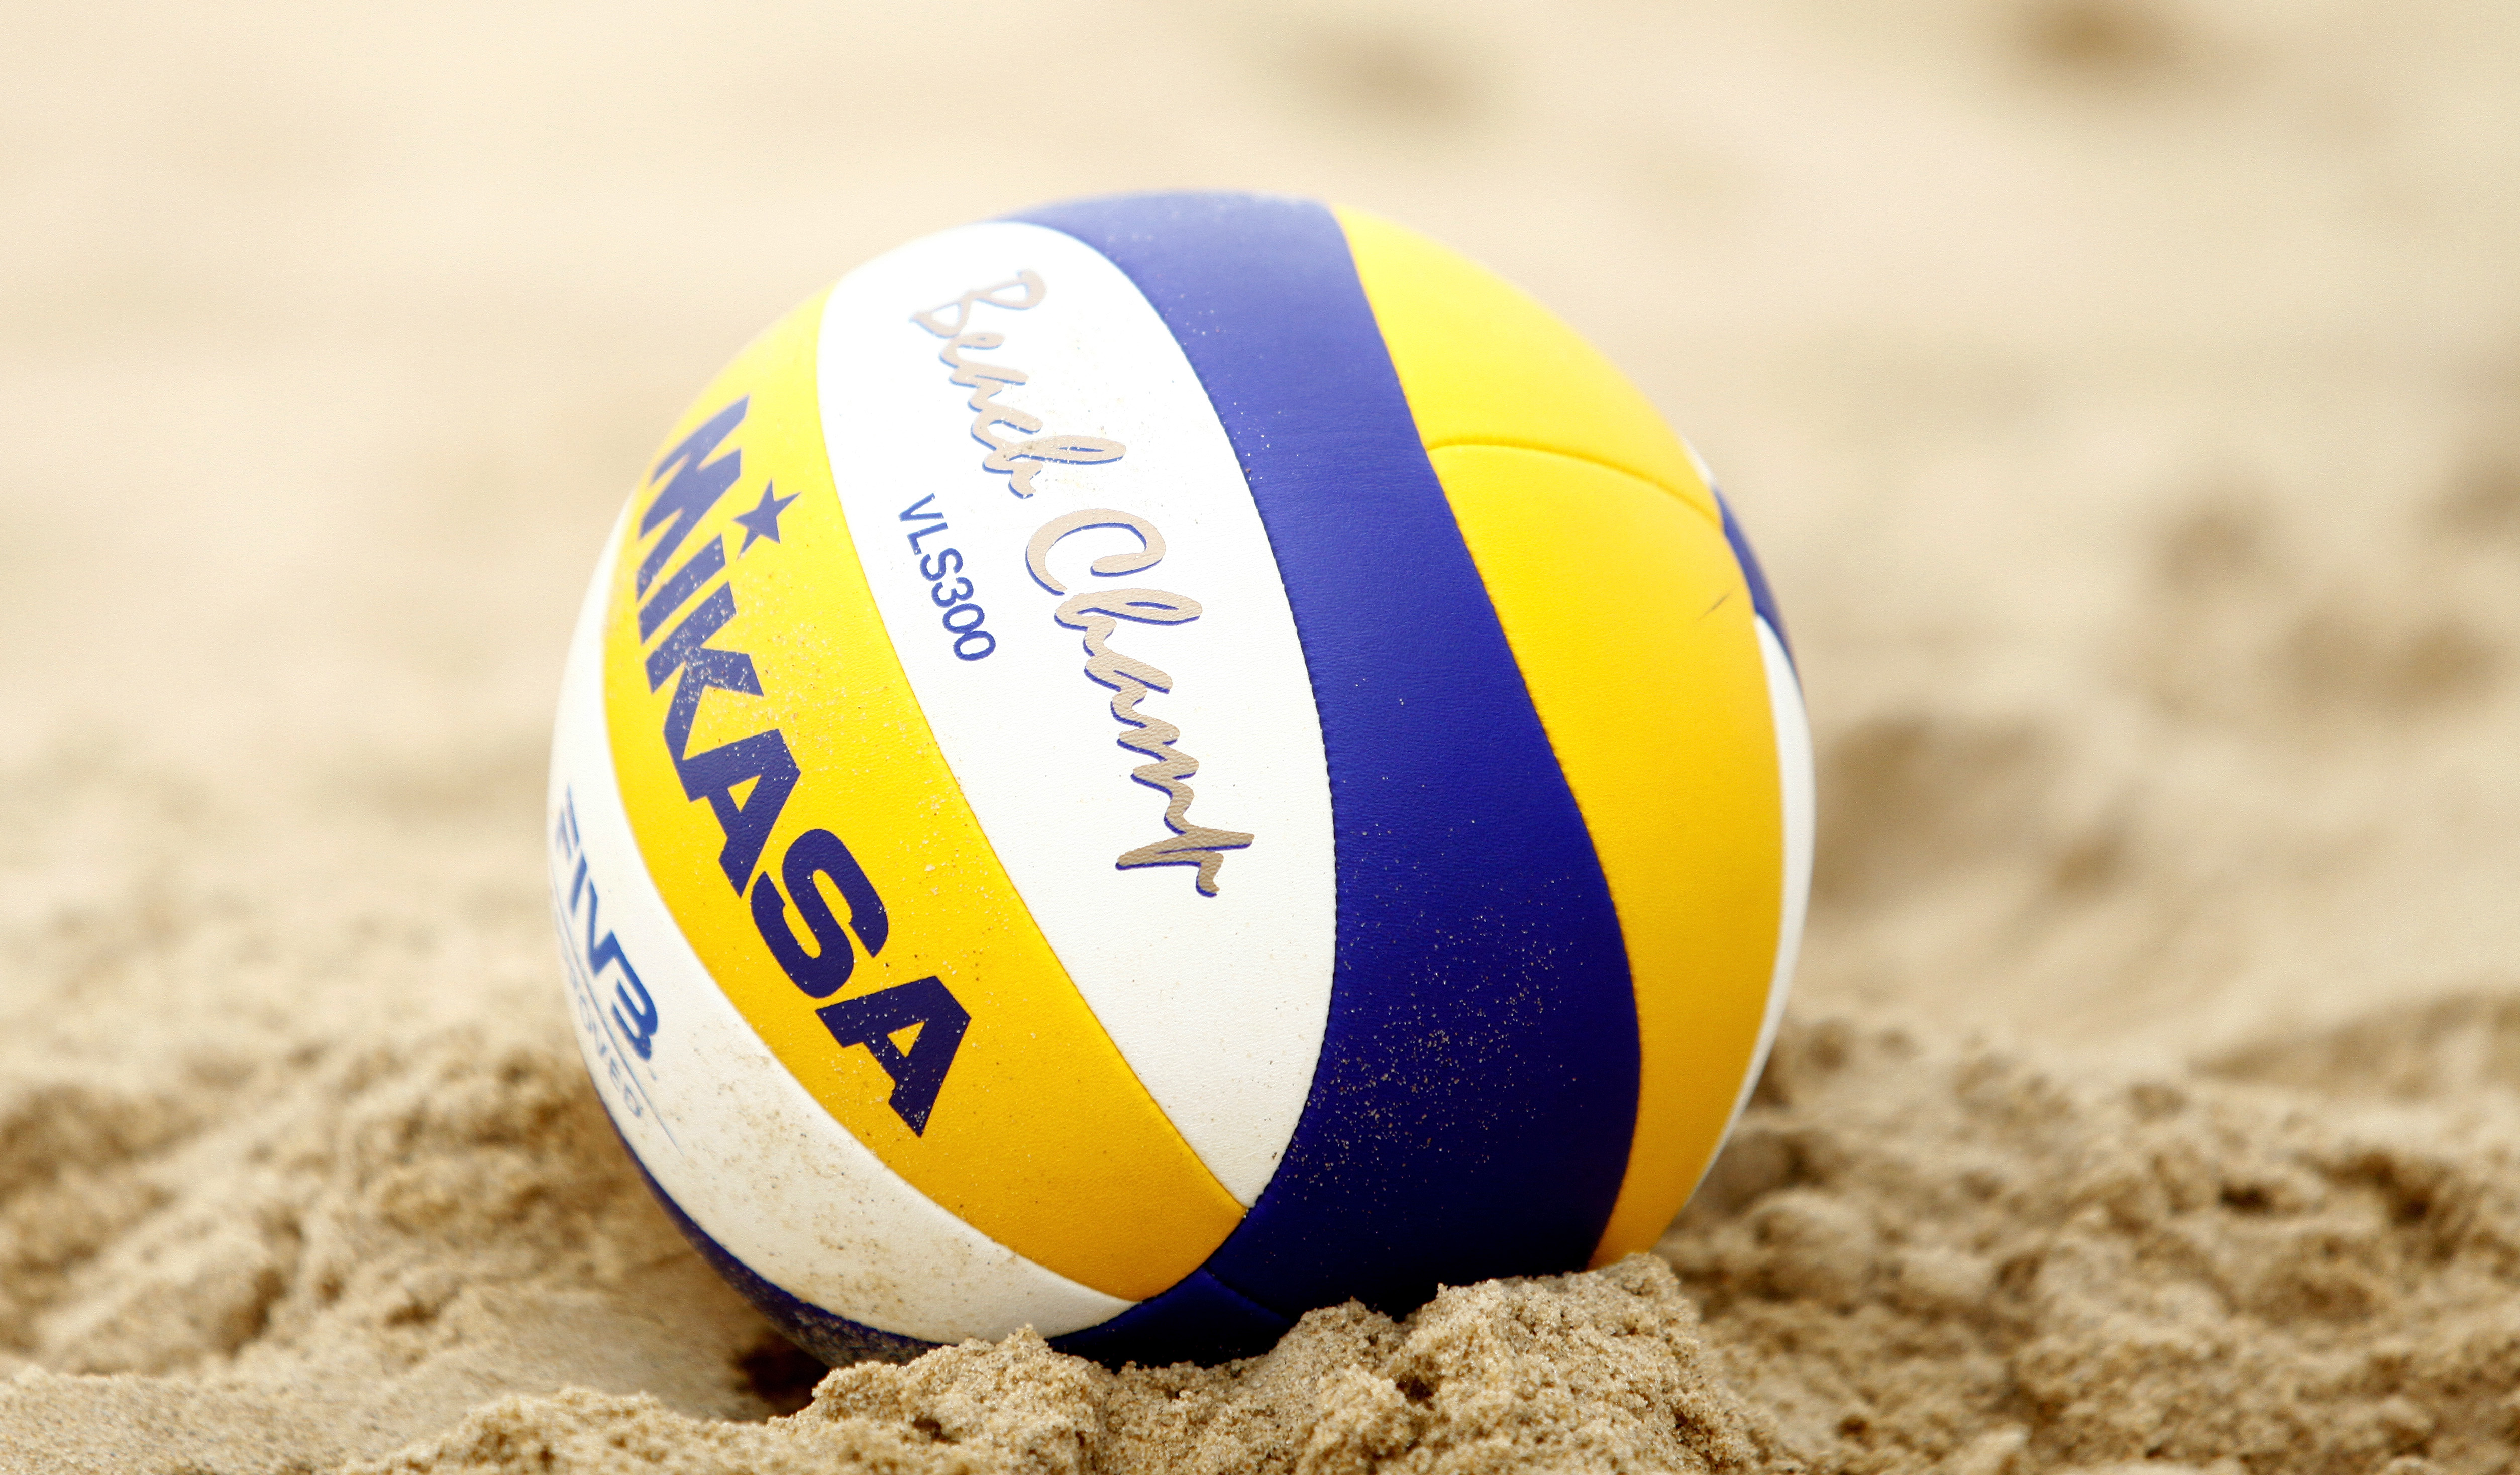 design senza tempo 8cdb9 31b10 Beach Volley Ball Tournament in Méribel - French Alps ...